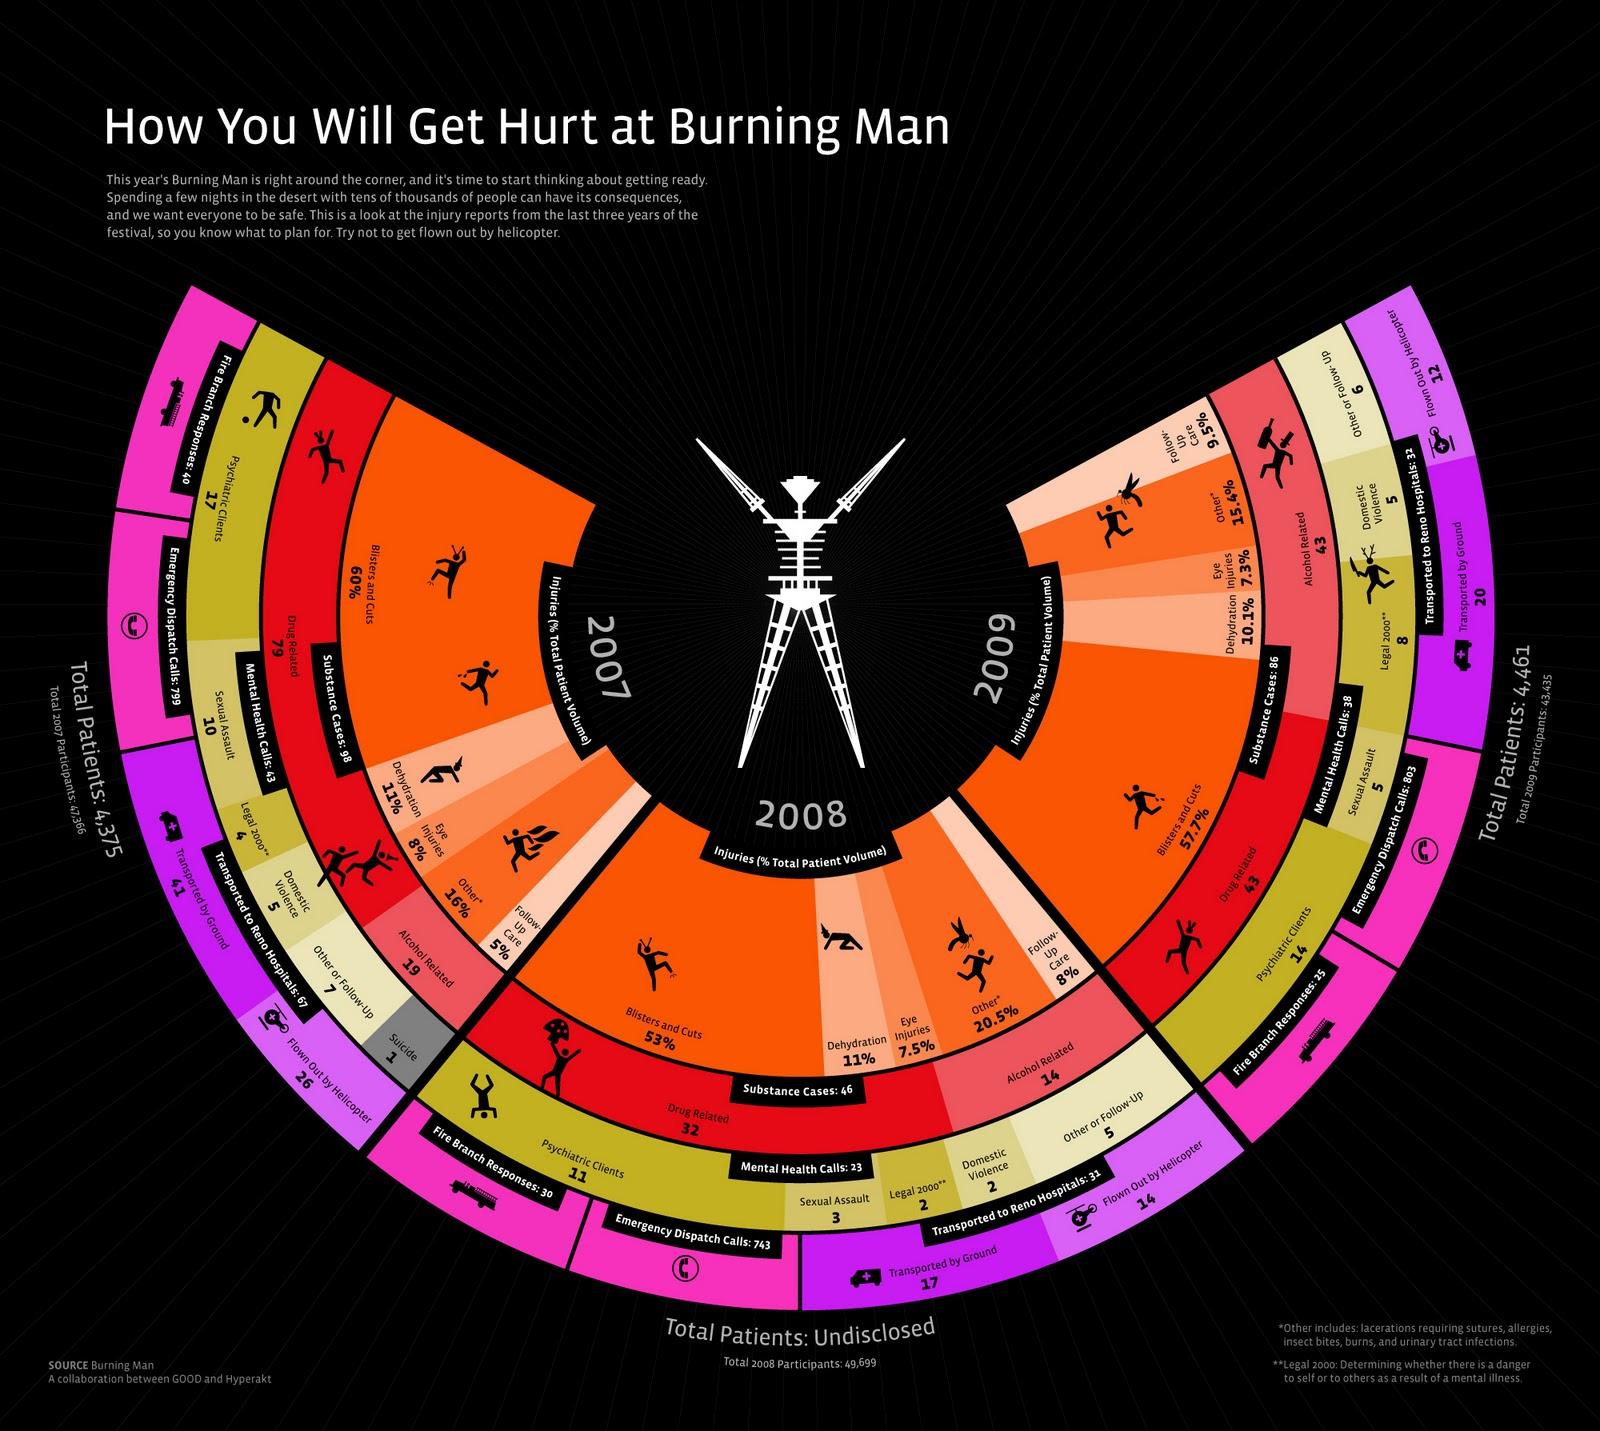 http://3.bp.blogspot.com/_ihrs8NzHWHU/TU8zErS1aRI/AAAAAAAACU0/RrPKnMR04Xo/s1600/BurningMan_GOOD.jpg